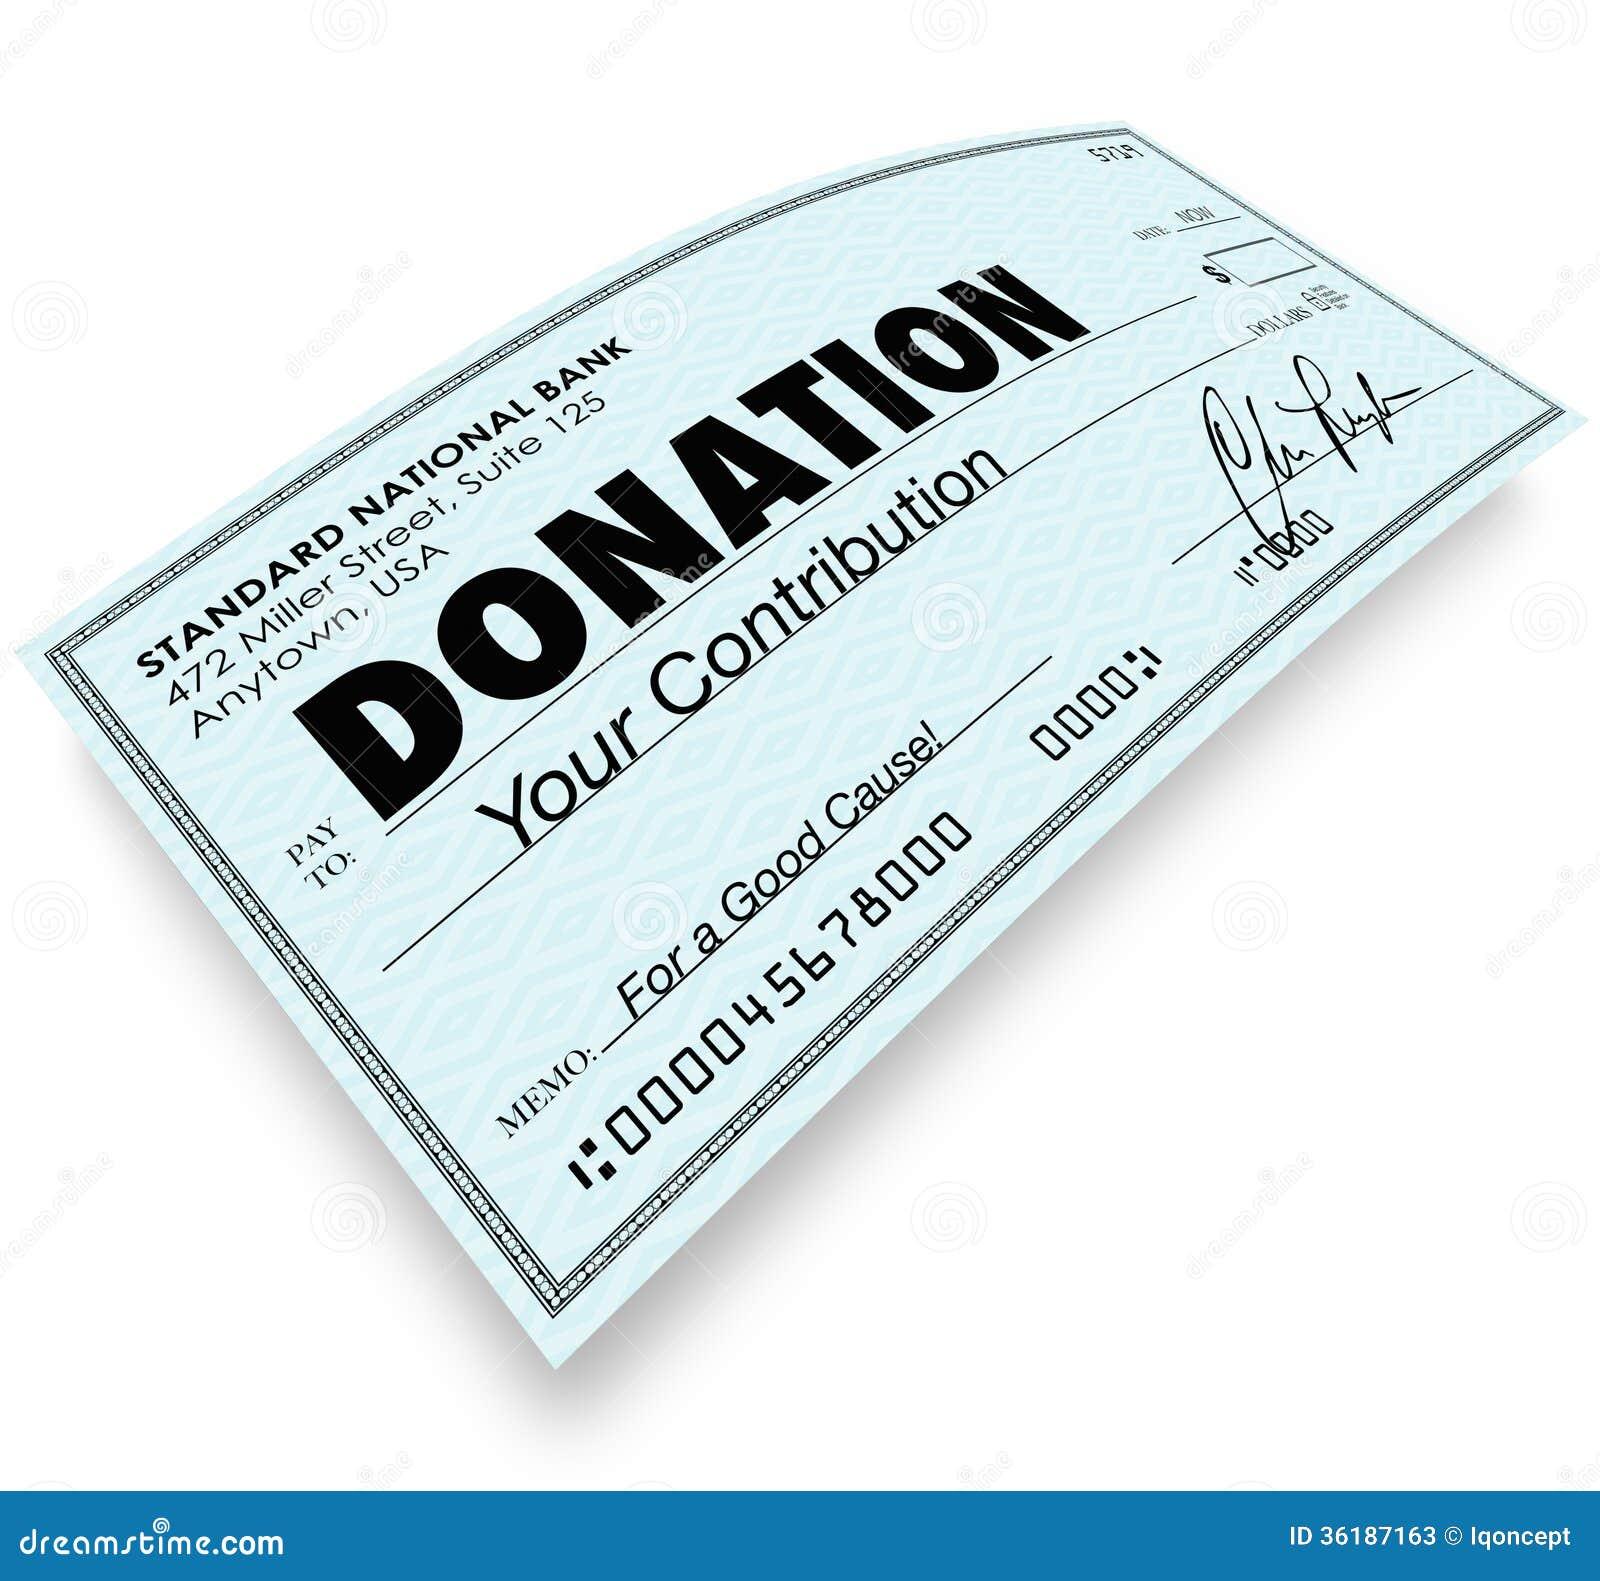 money donation clipart - photo #3